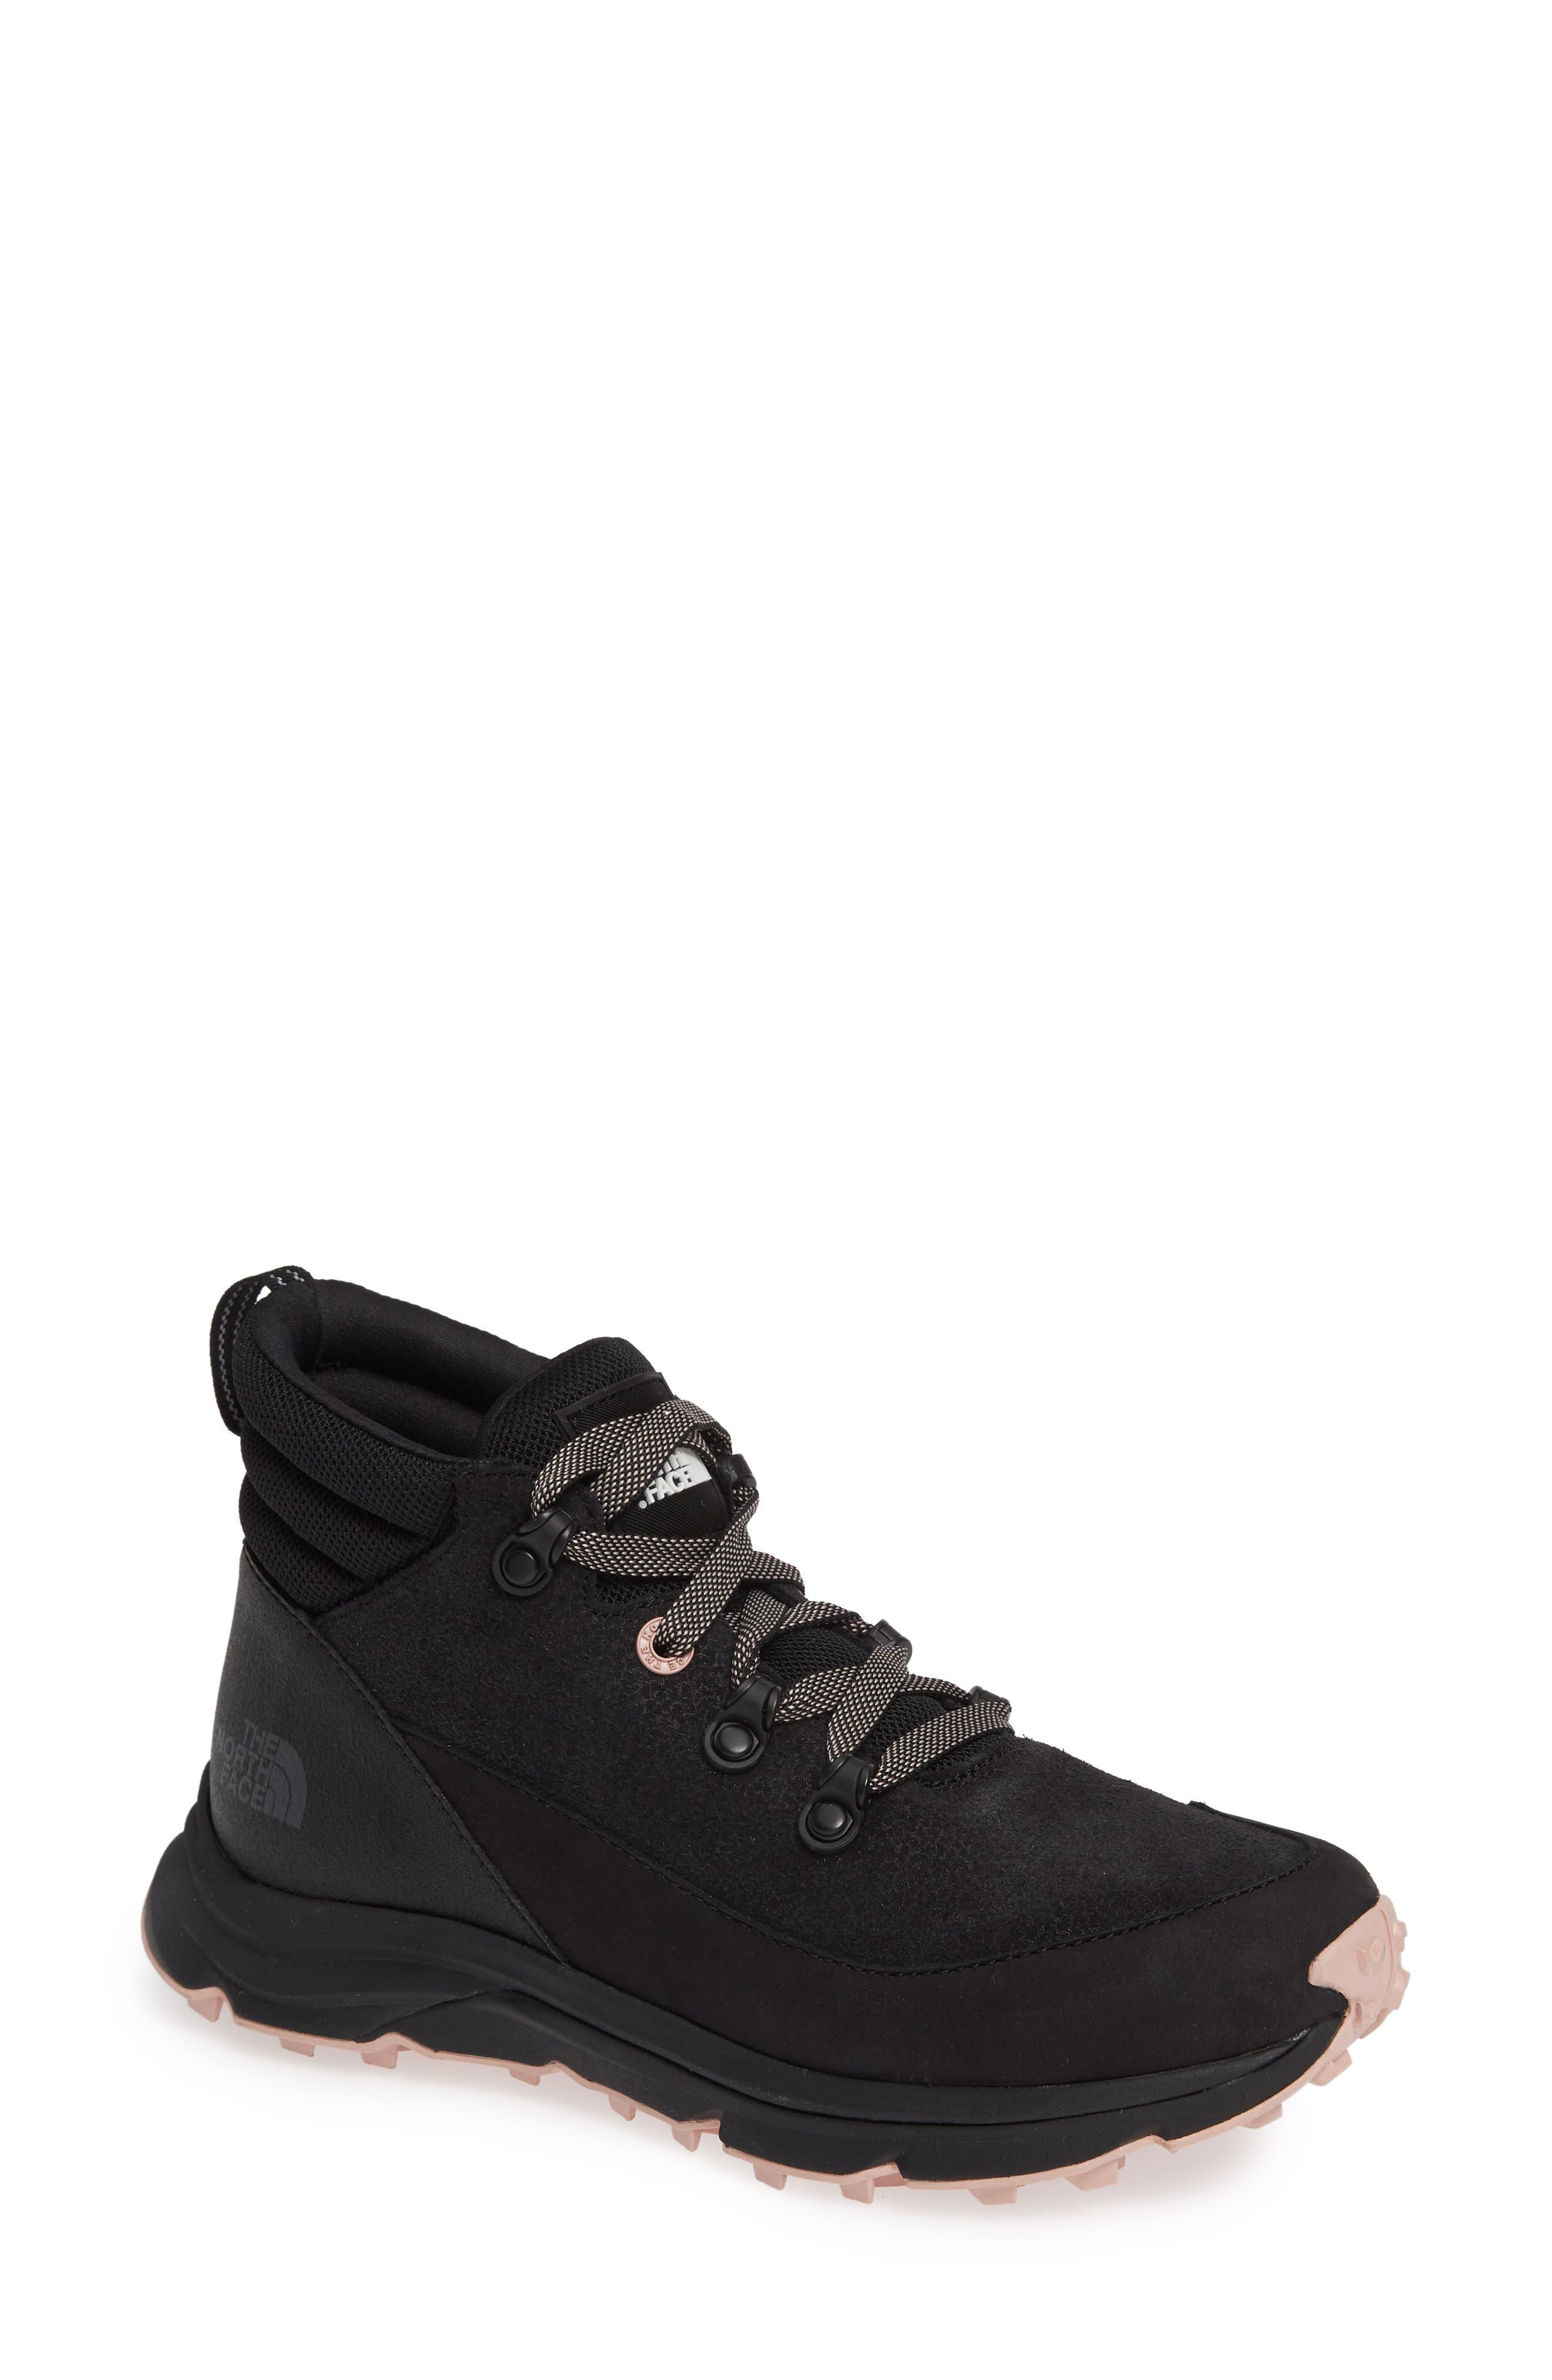 The North Face Raedonda Sneaker Boot